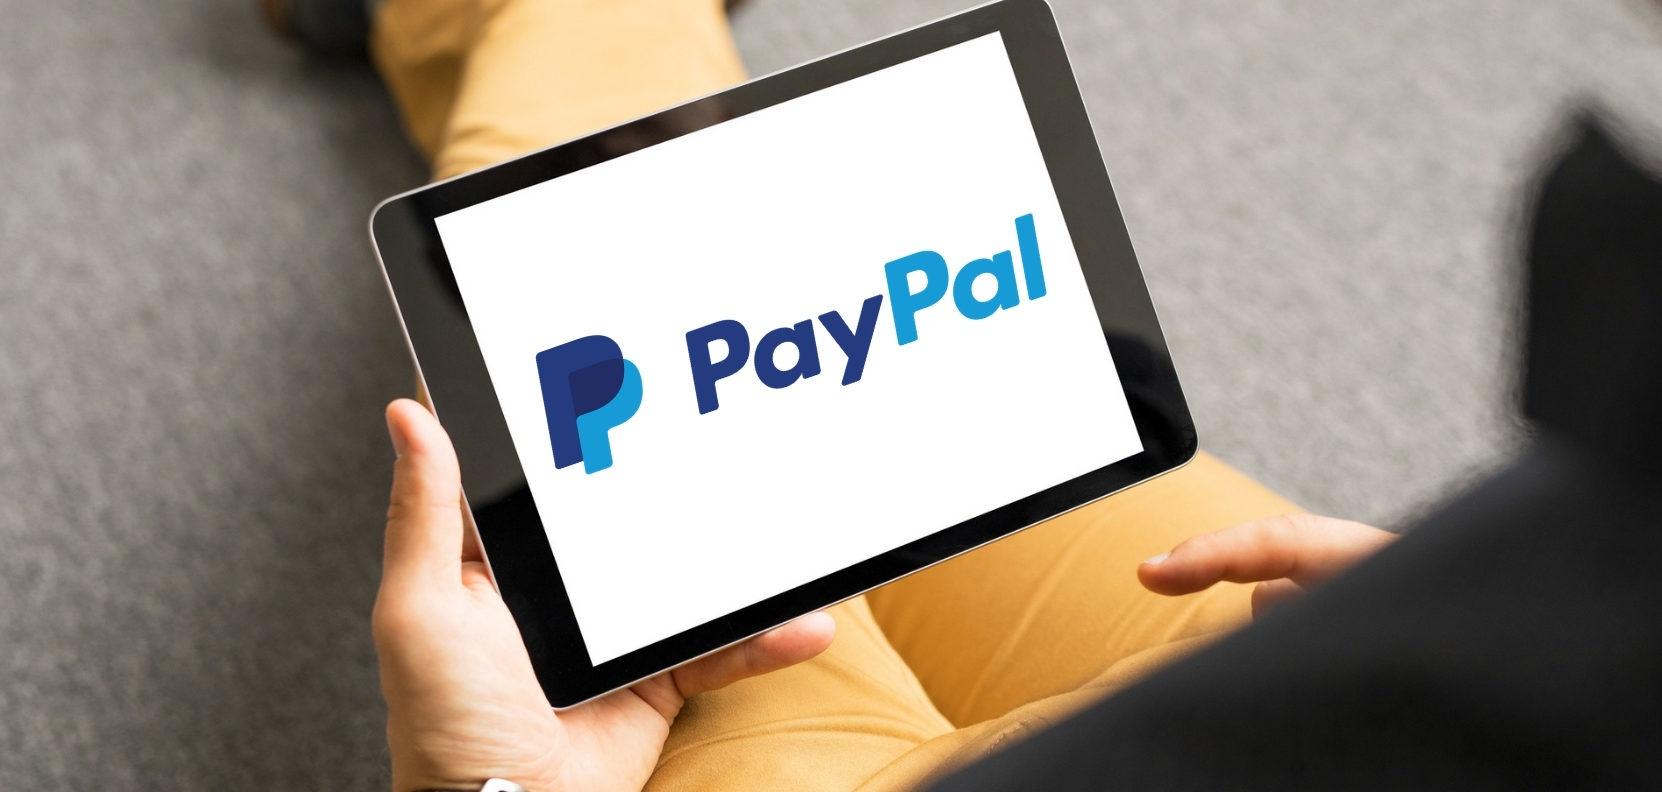 Carregar paypal com multibanco